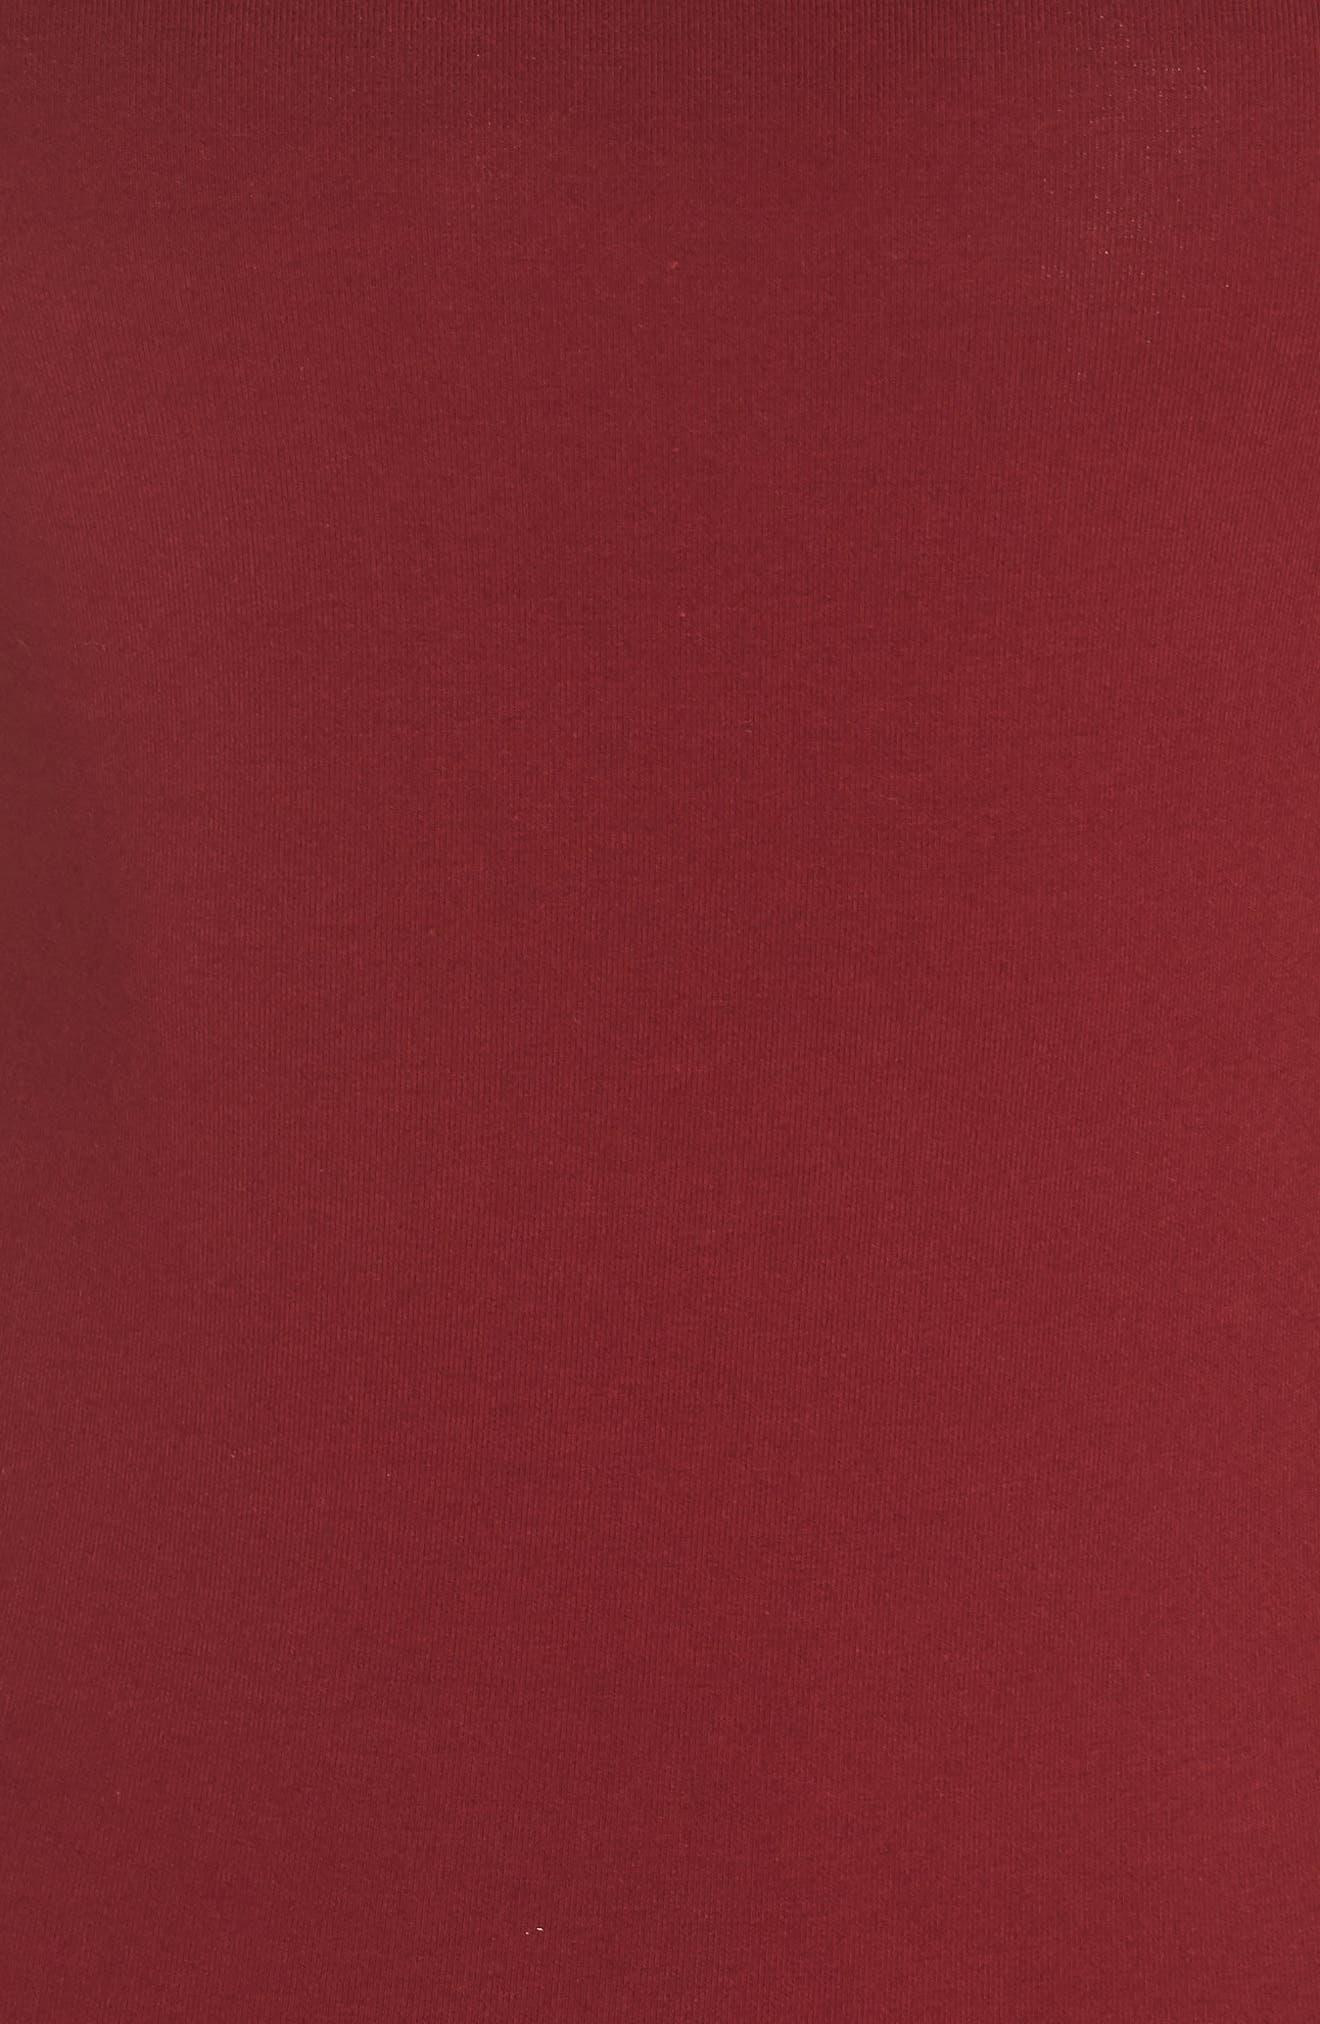 Originals 3-Stripes Dress,                             Alternate thumbnail 6, color,                             Collegiate Burgundy